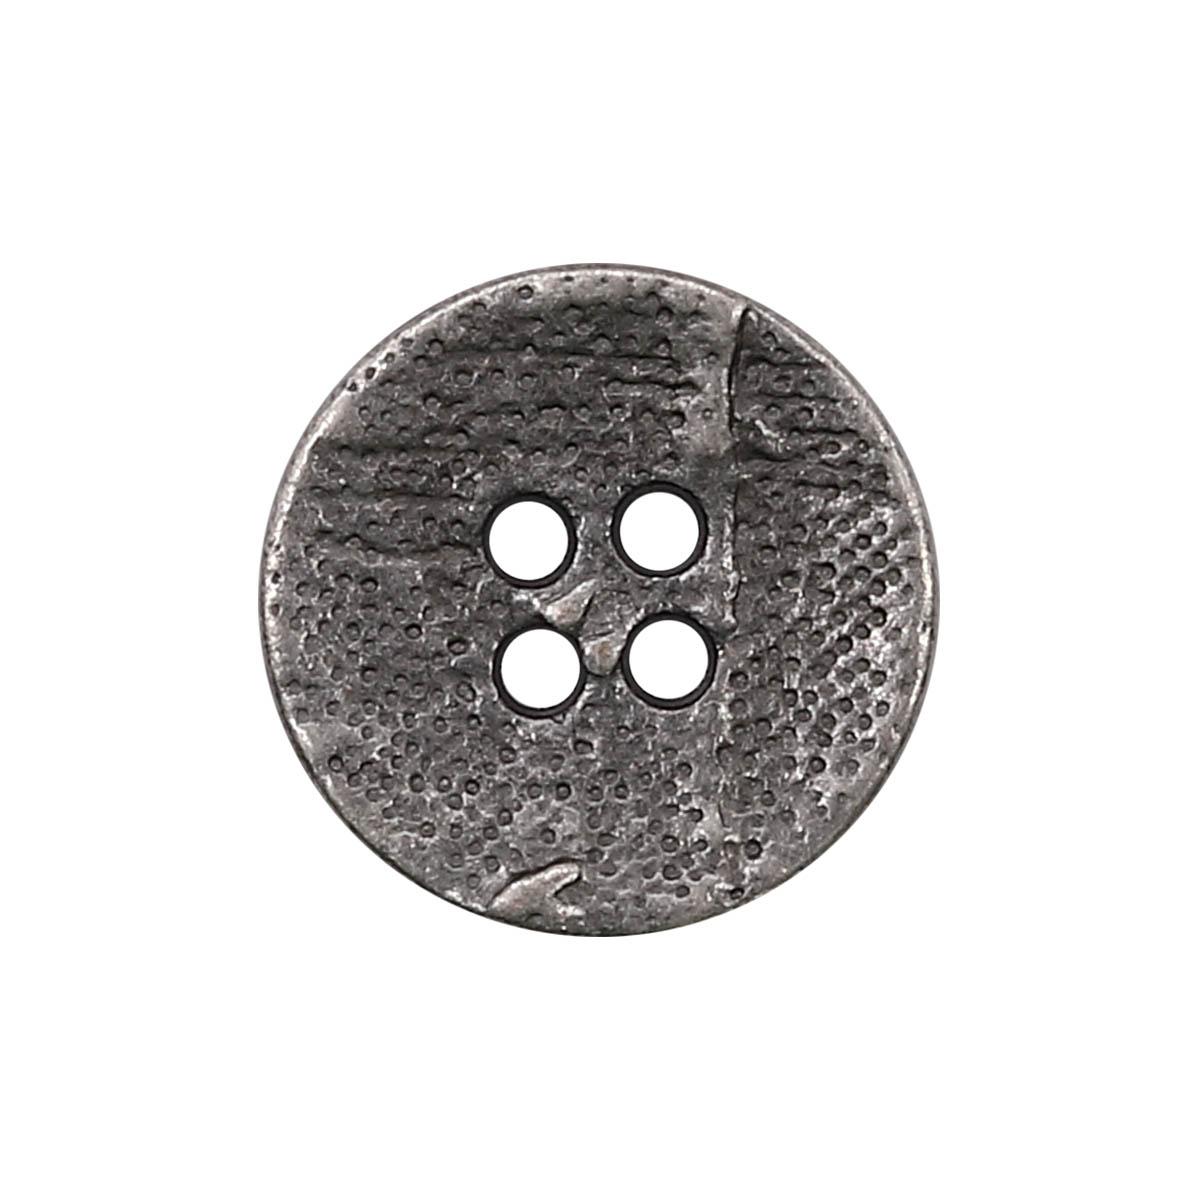 63365/4 Пуговица 4 прокола д-17мм т.сереб.мет. ГР